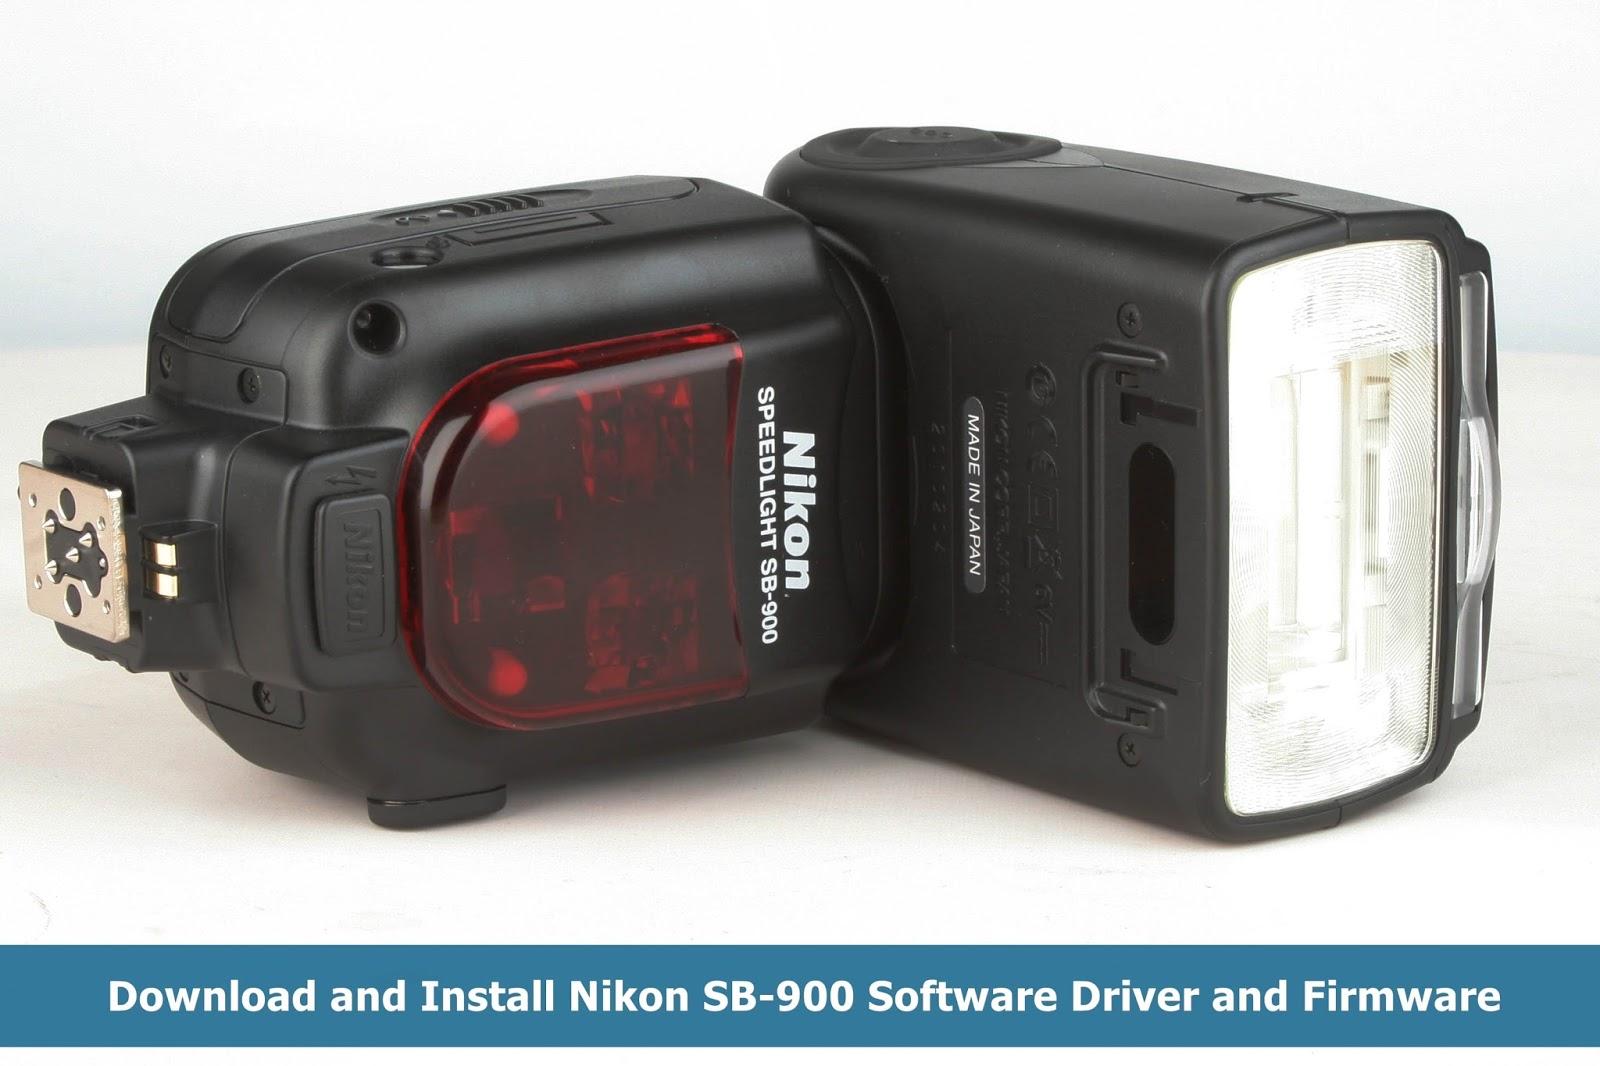 Nikon SB-900 Software Driver and Firmware